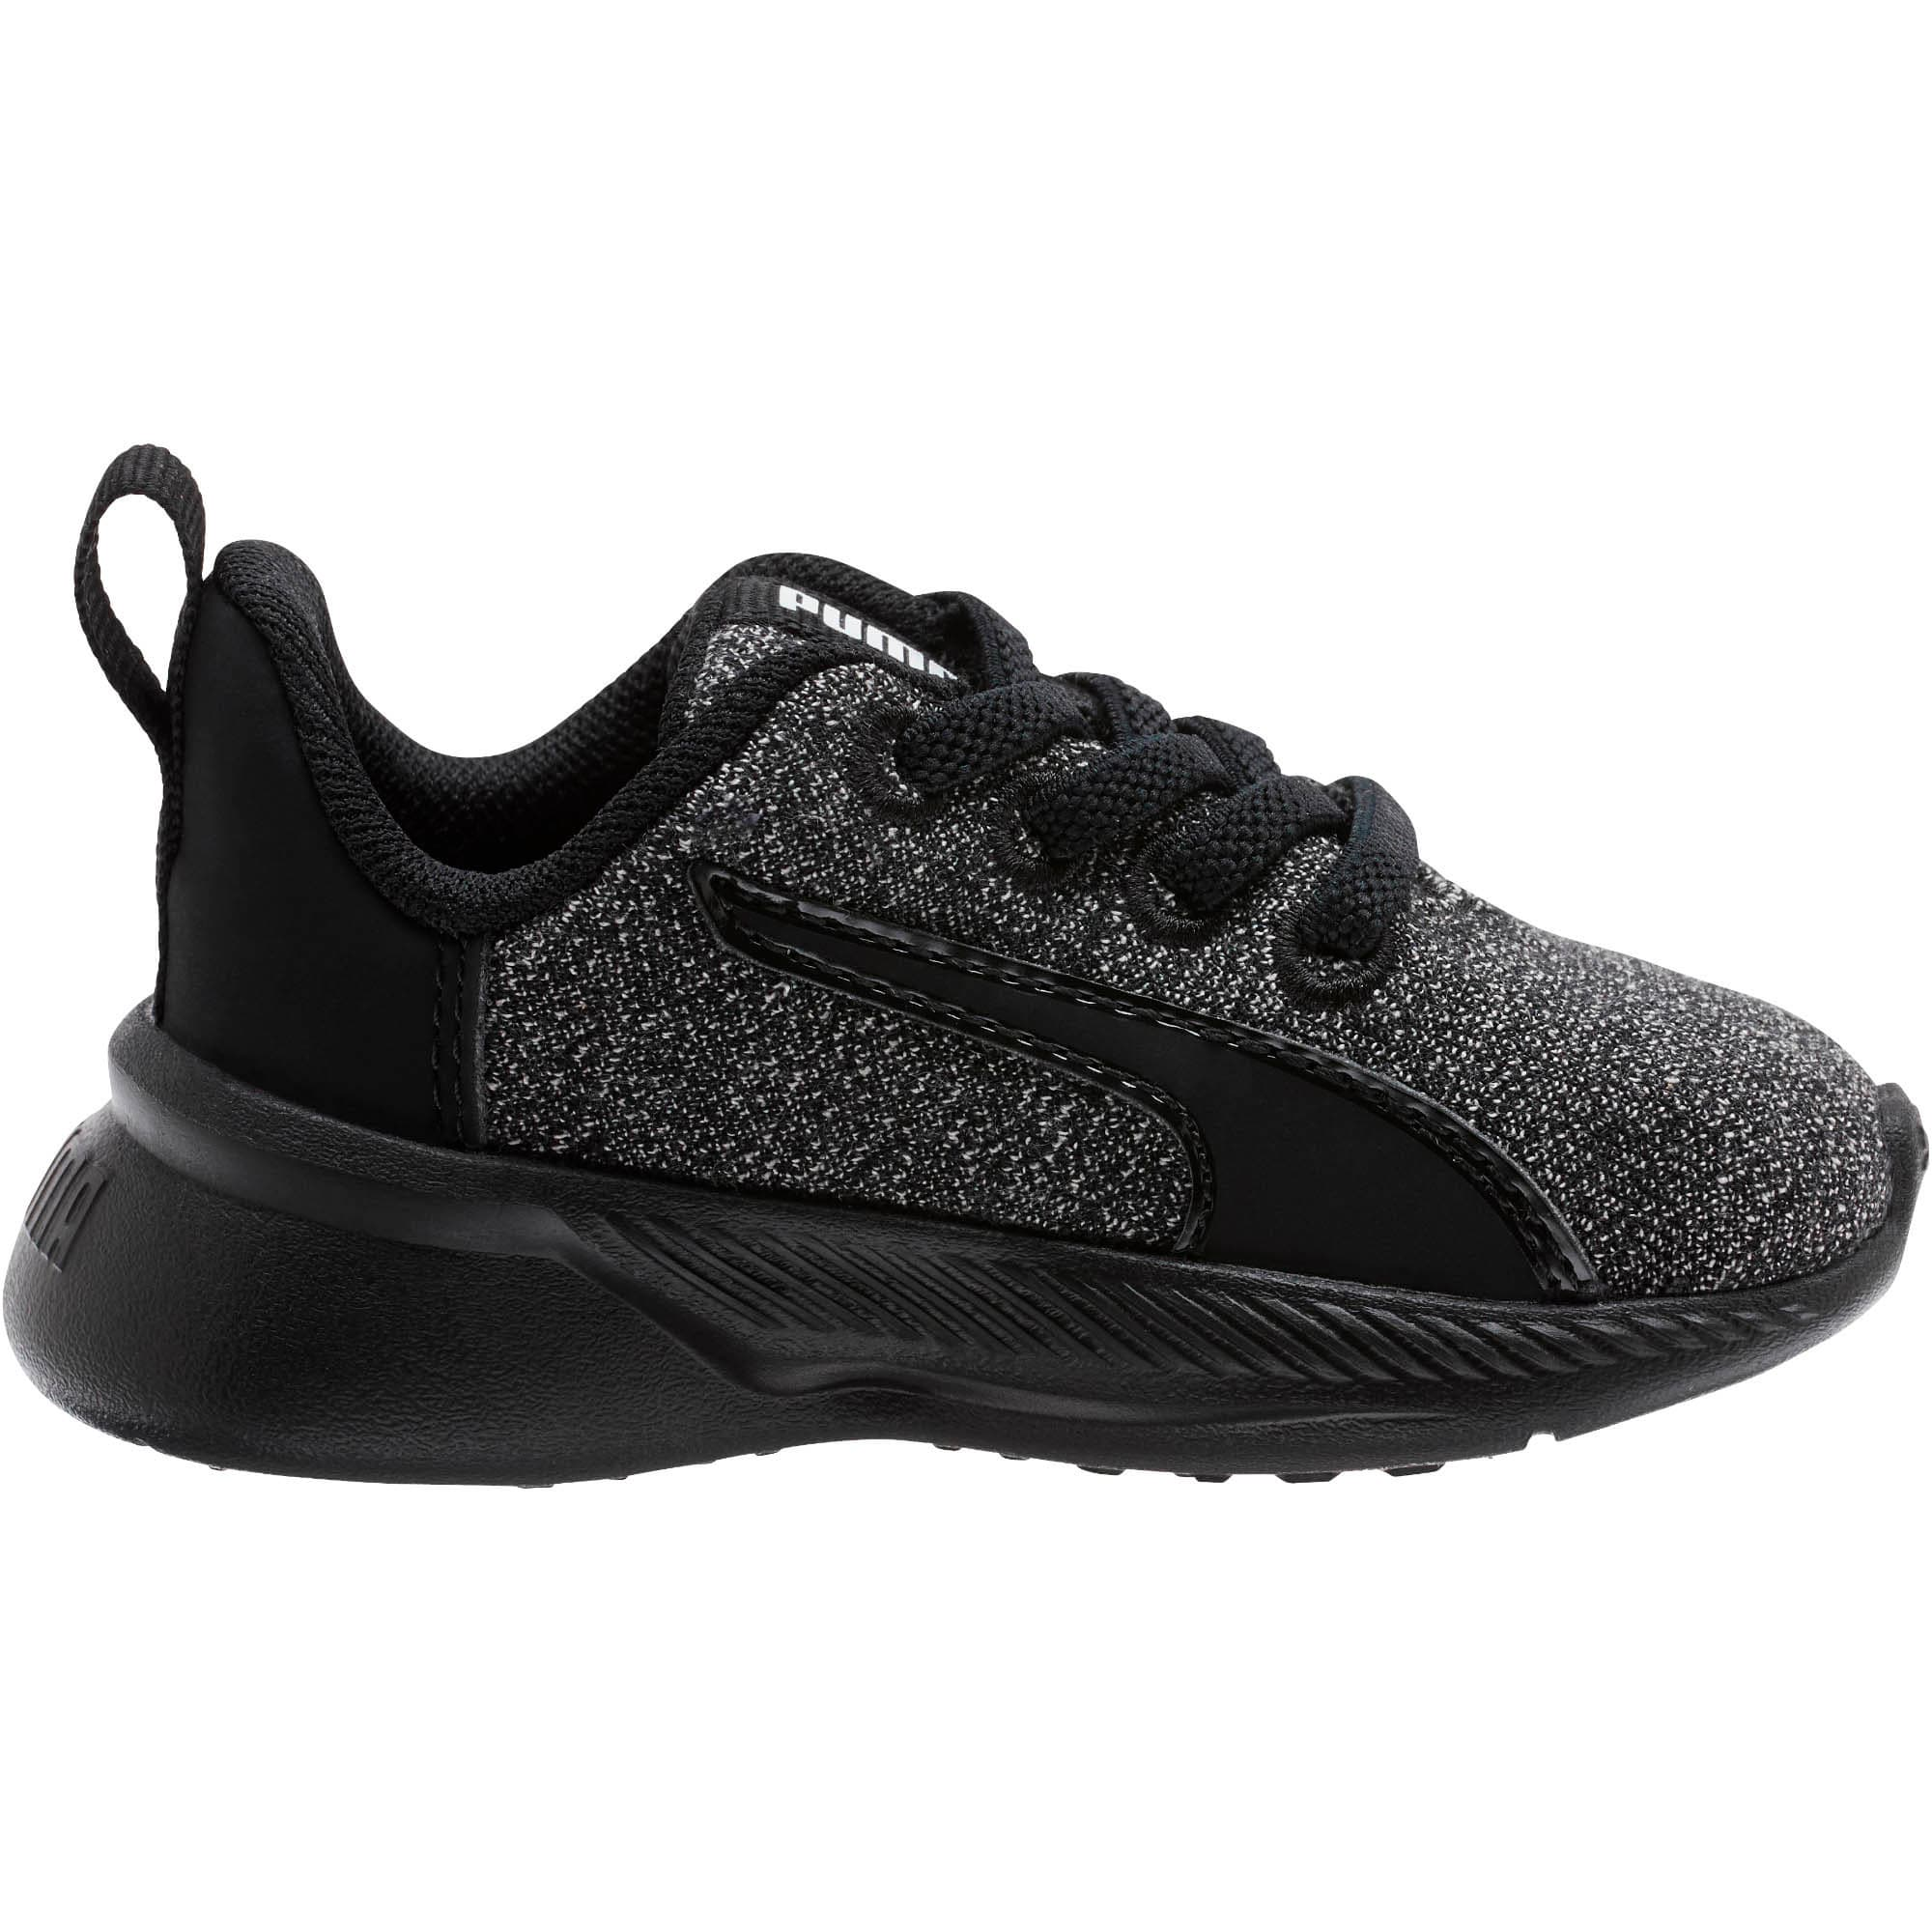 Thumbnail 4 of Tishatsu Runner Knit Toddler Shoes, Puma Black-Puma White, medium